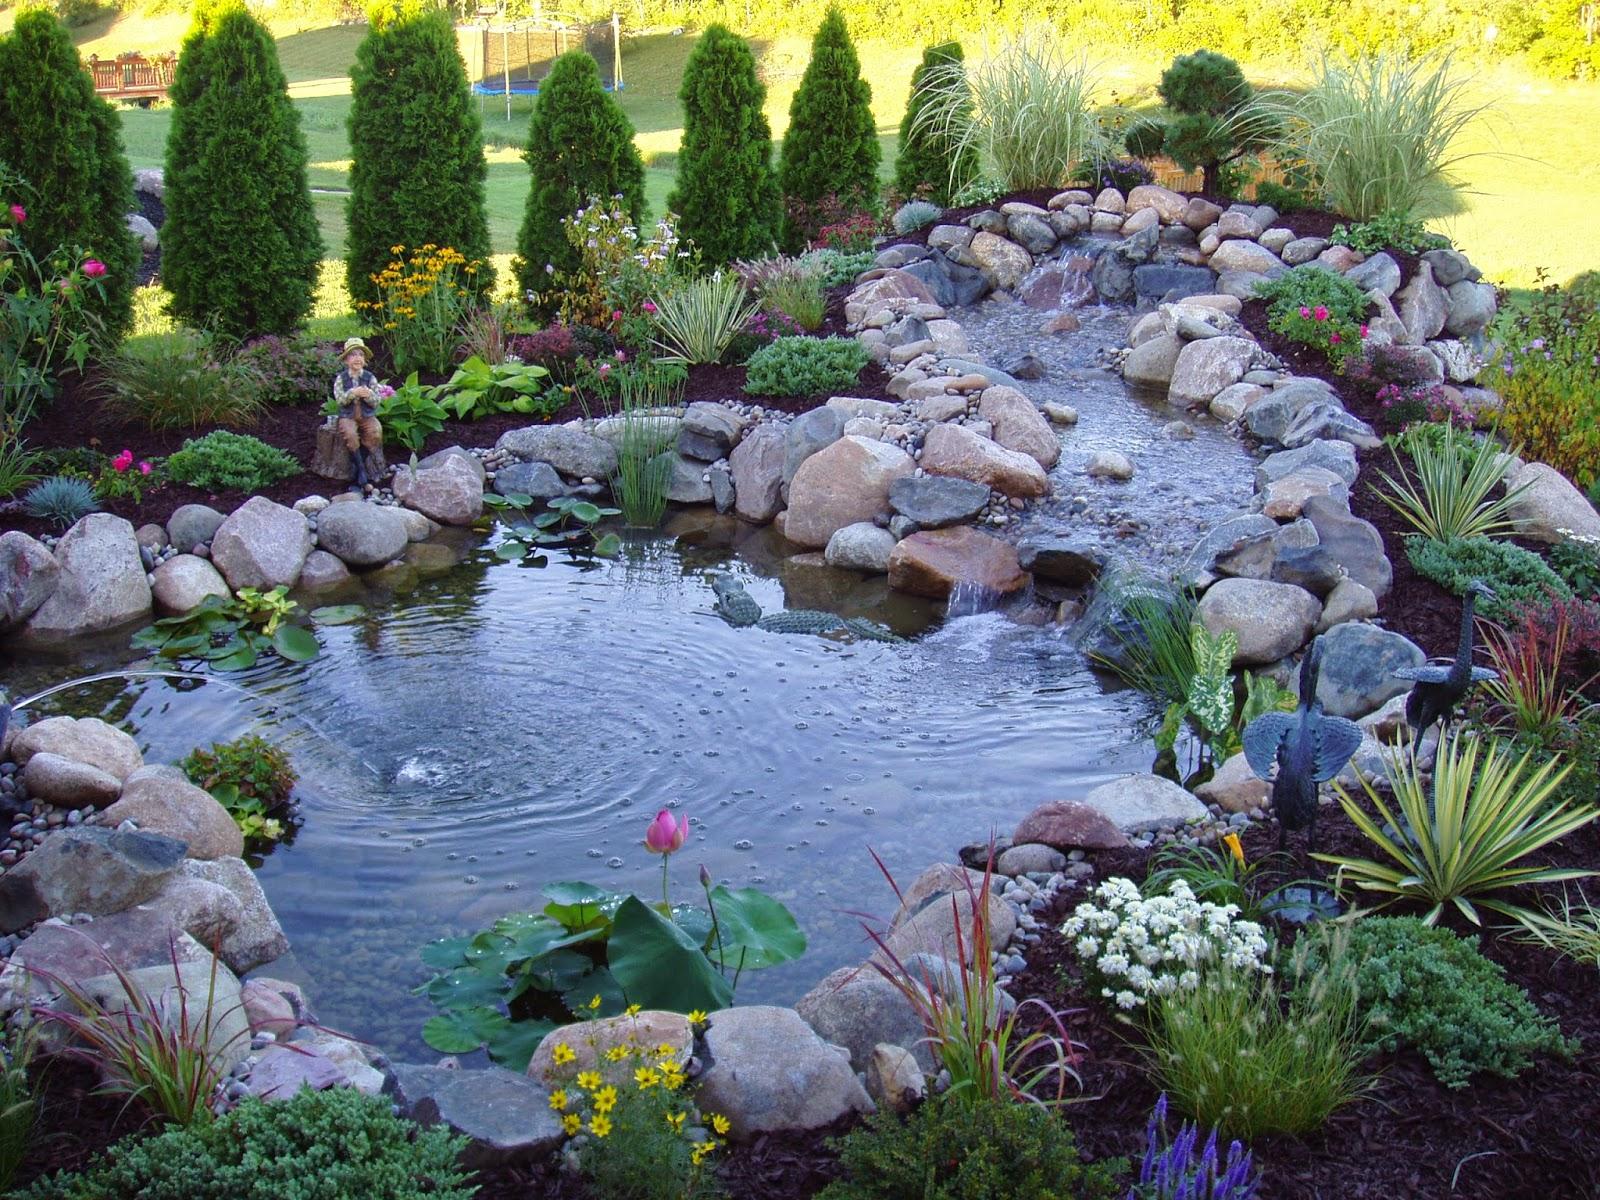 29 outstanding landscaping ideas for backyard creeks. Black Bedroom Furniture Sets. Home Design Ideas